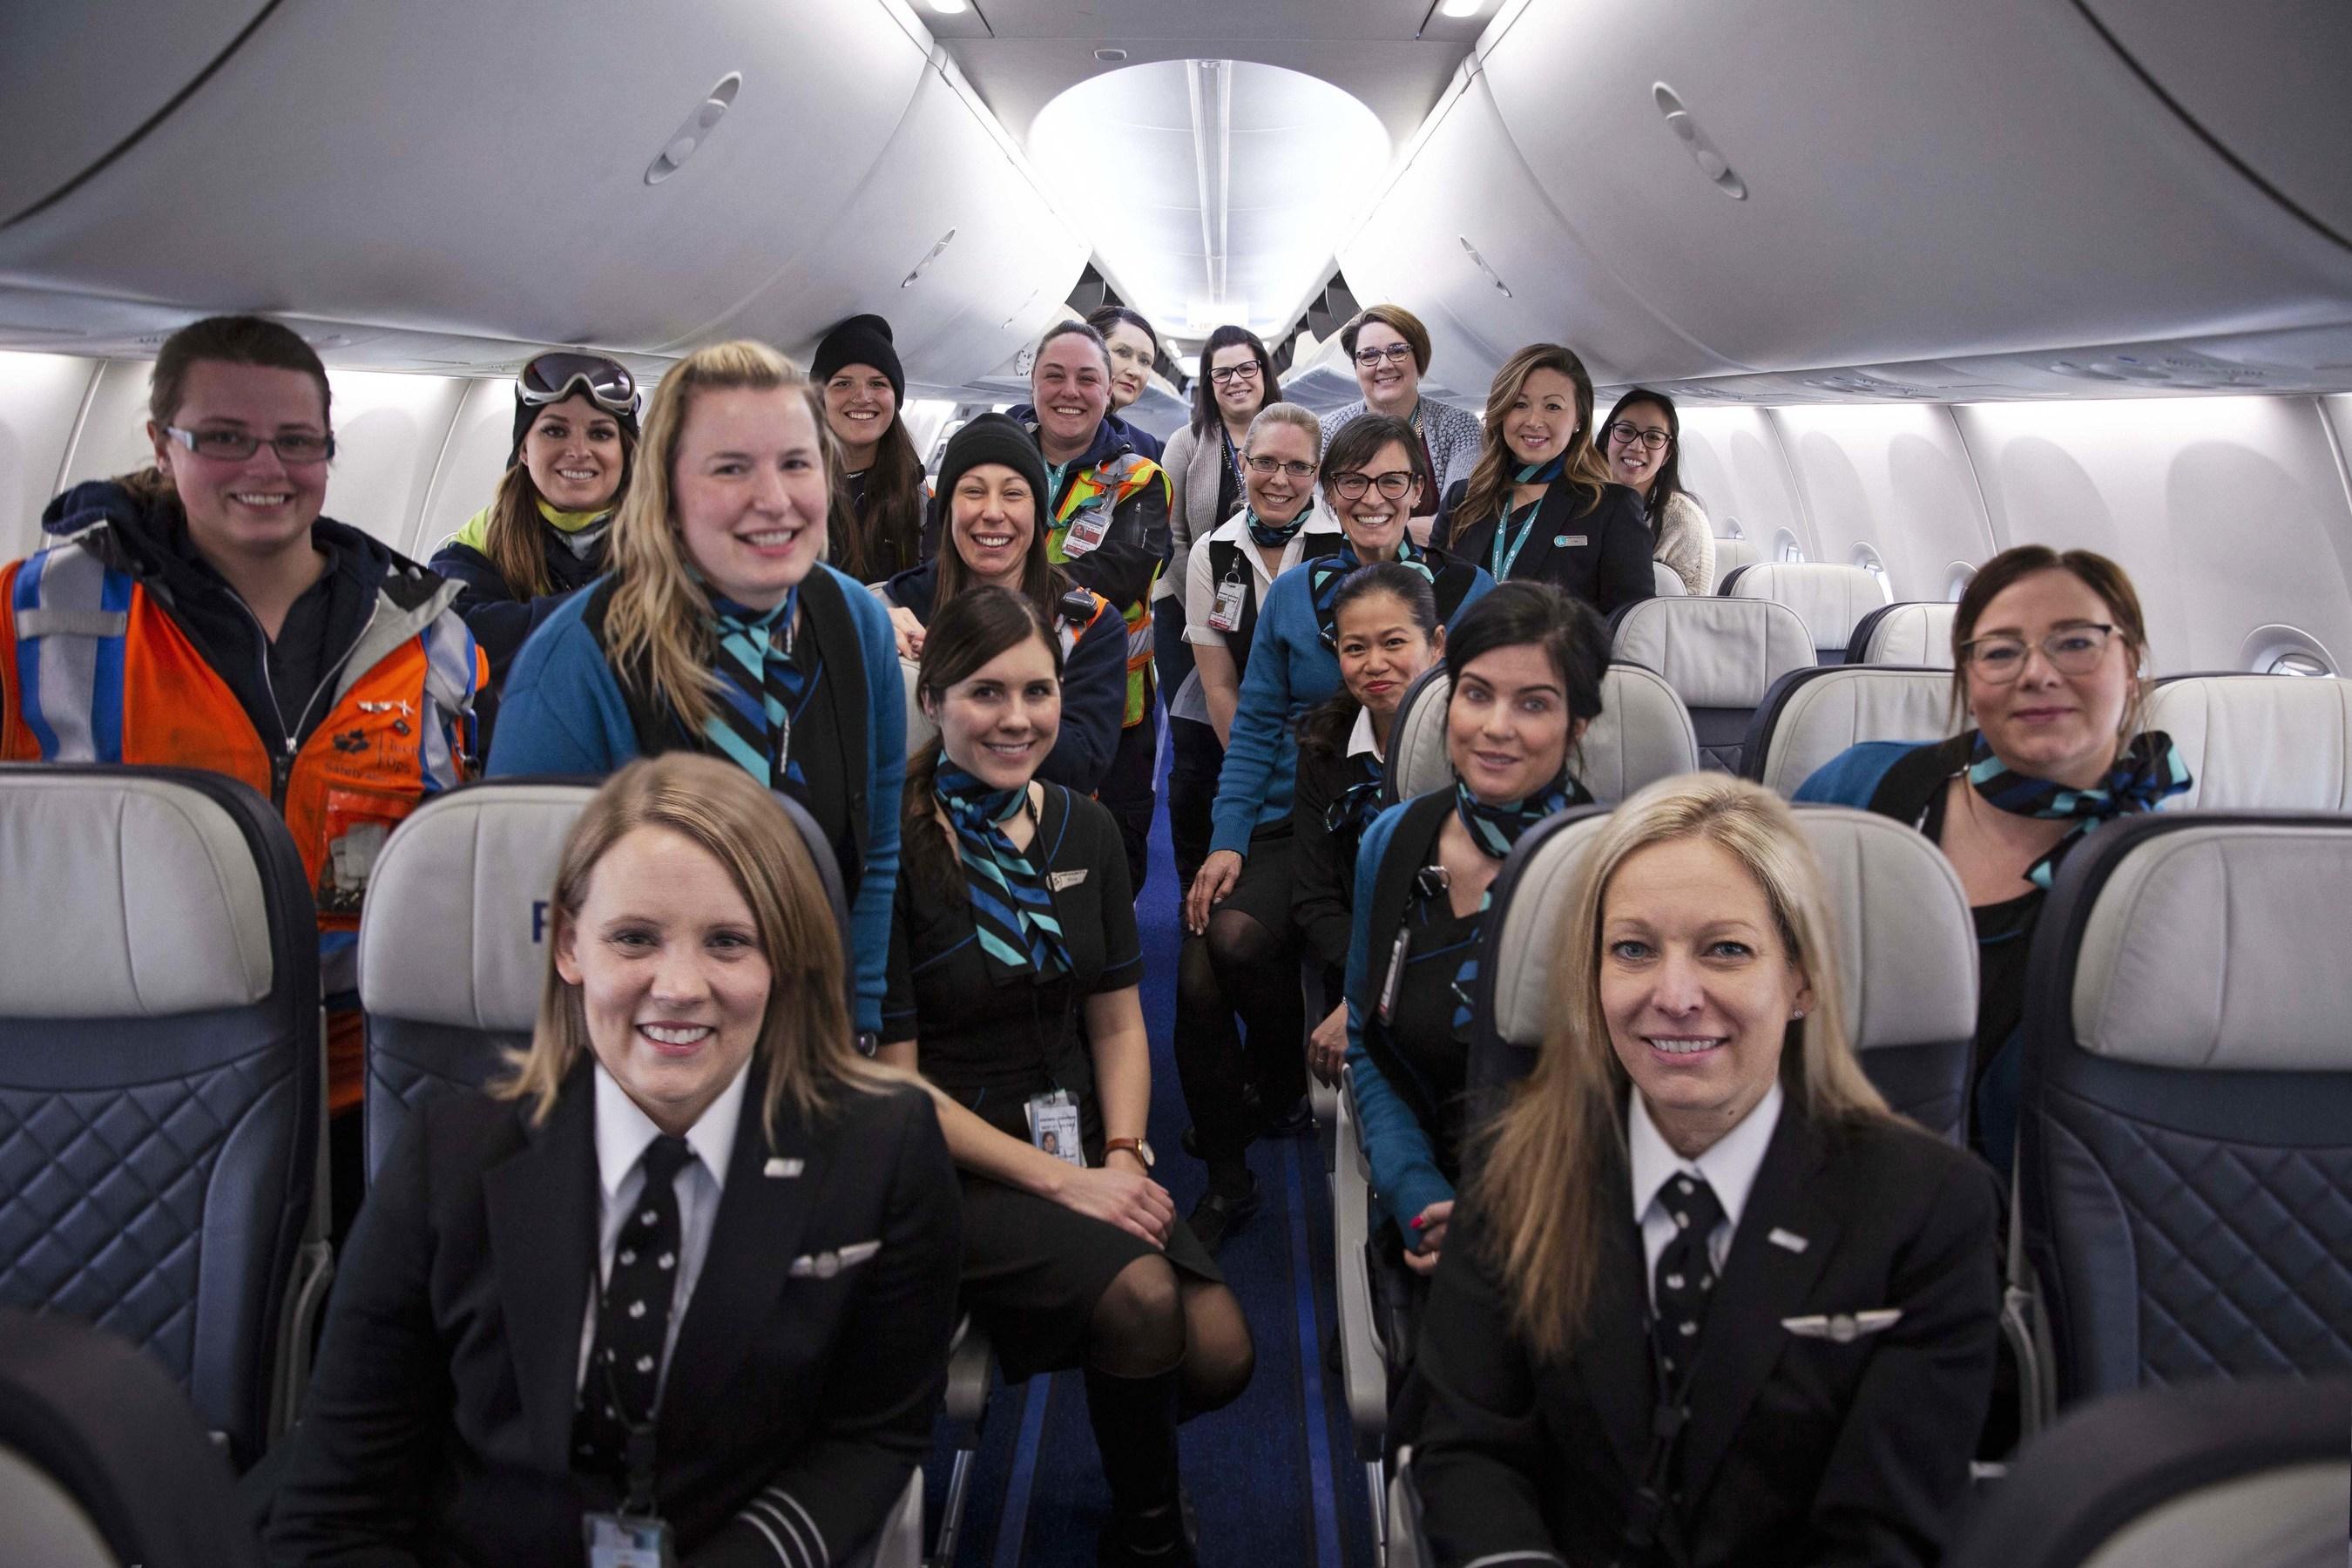 WestJet's all female flight and ground crew from flight 2250 (CNW Group/WESTJET, an Alberta Partnership)